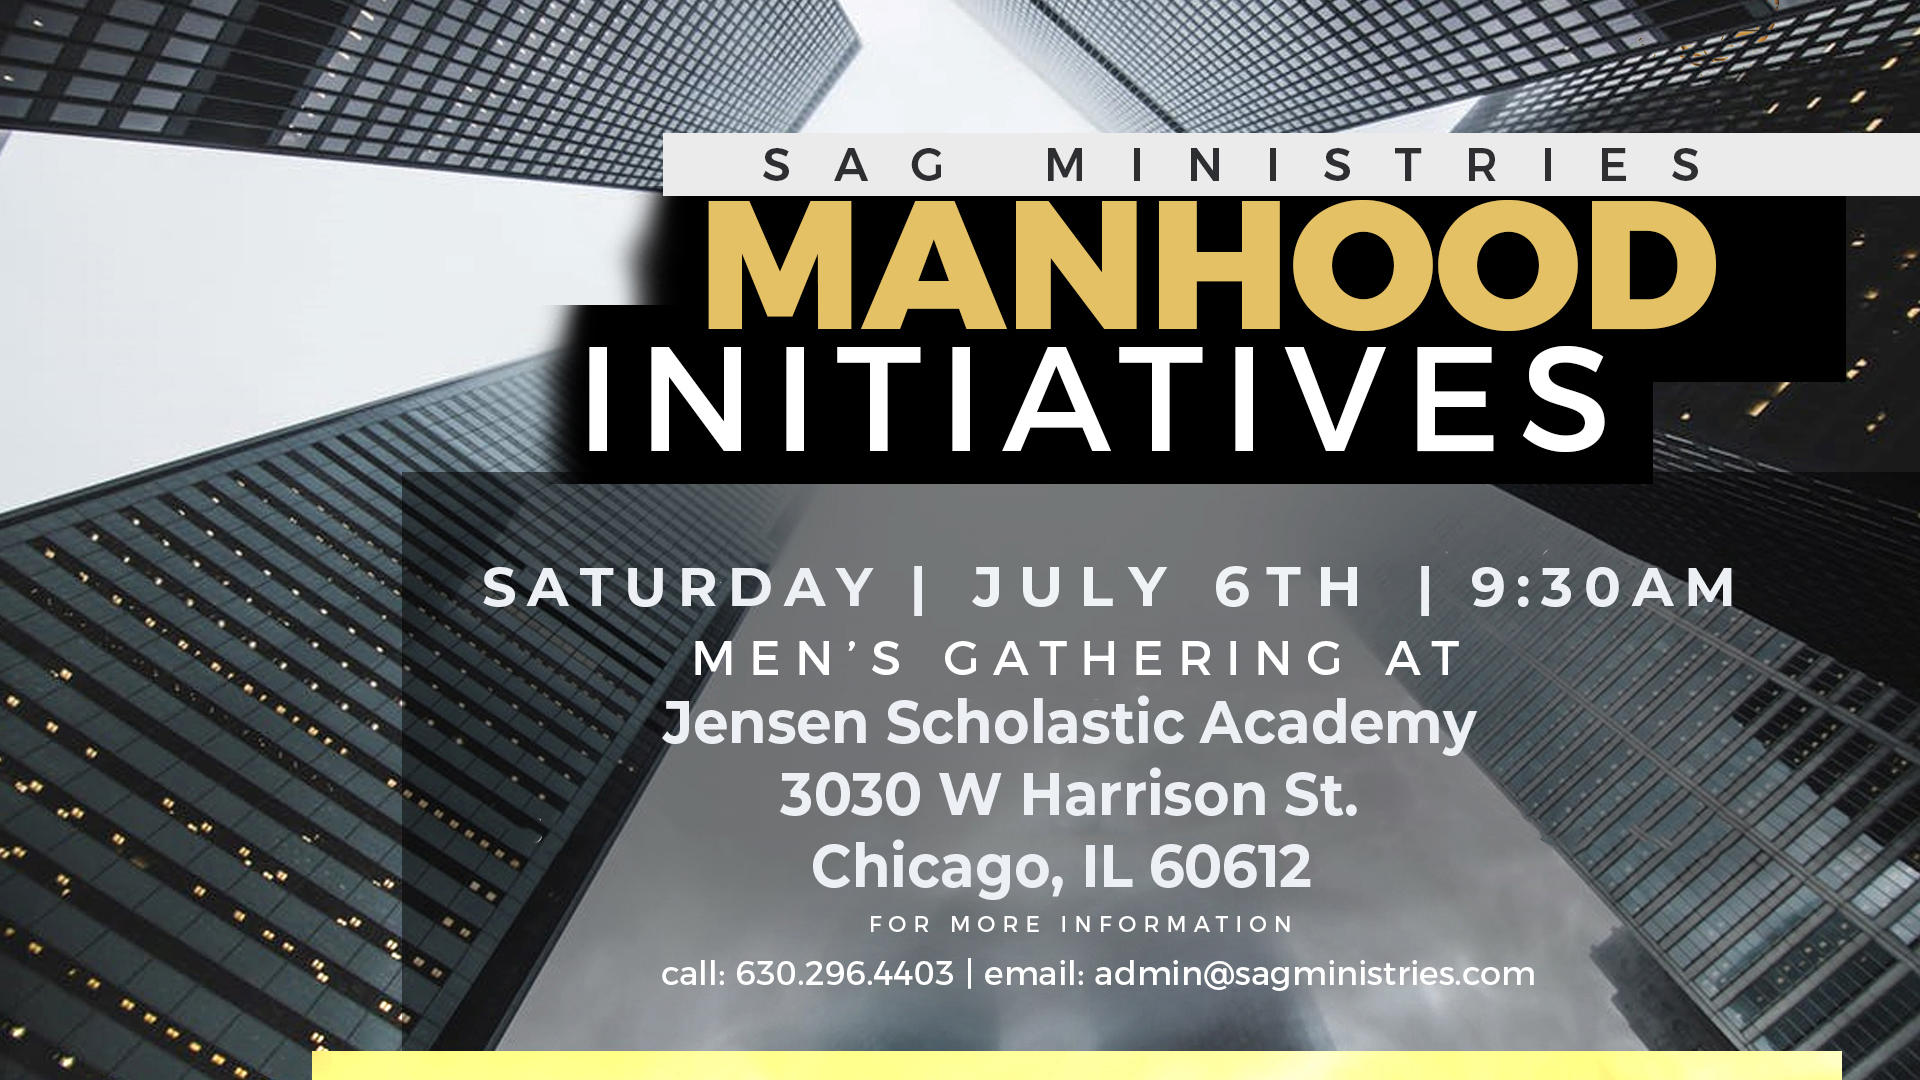 Manhood Initiatives_April2019_(1080p).jpg